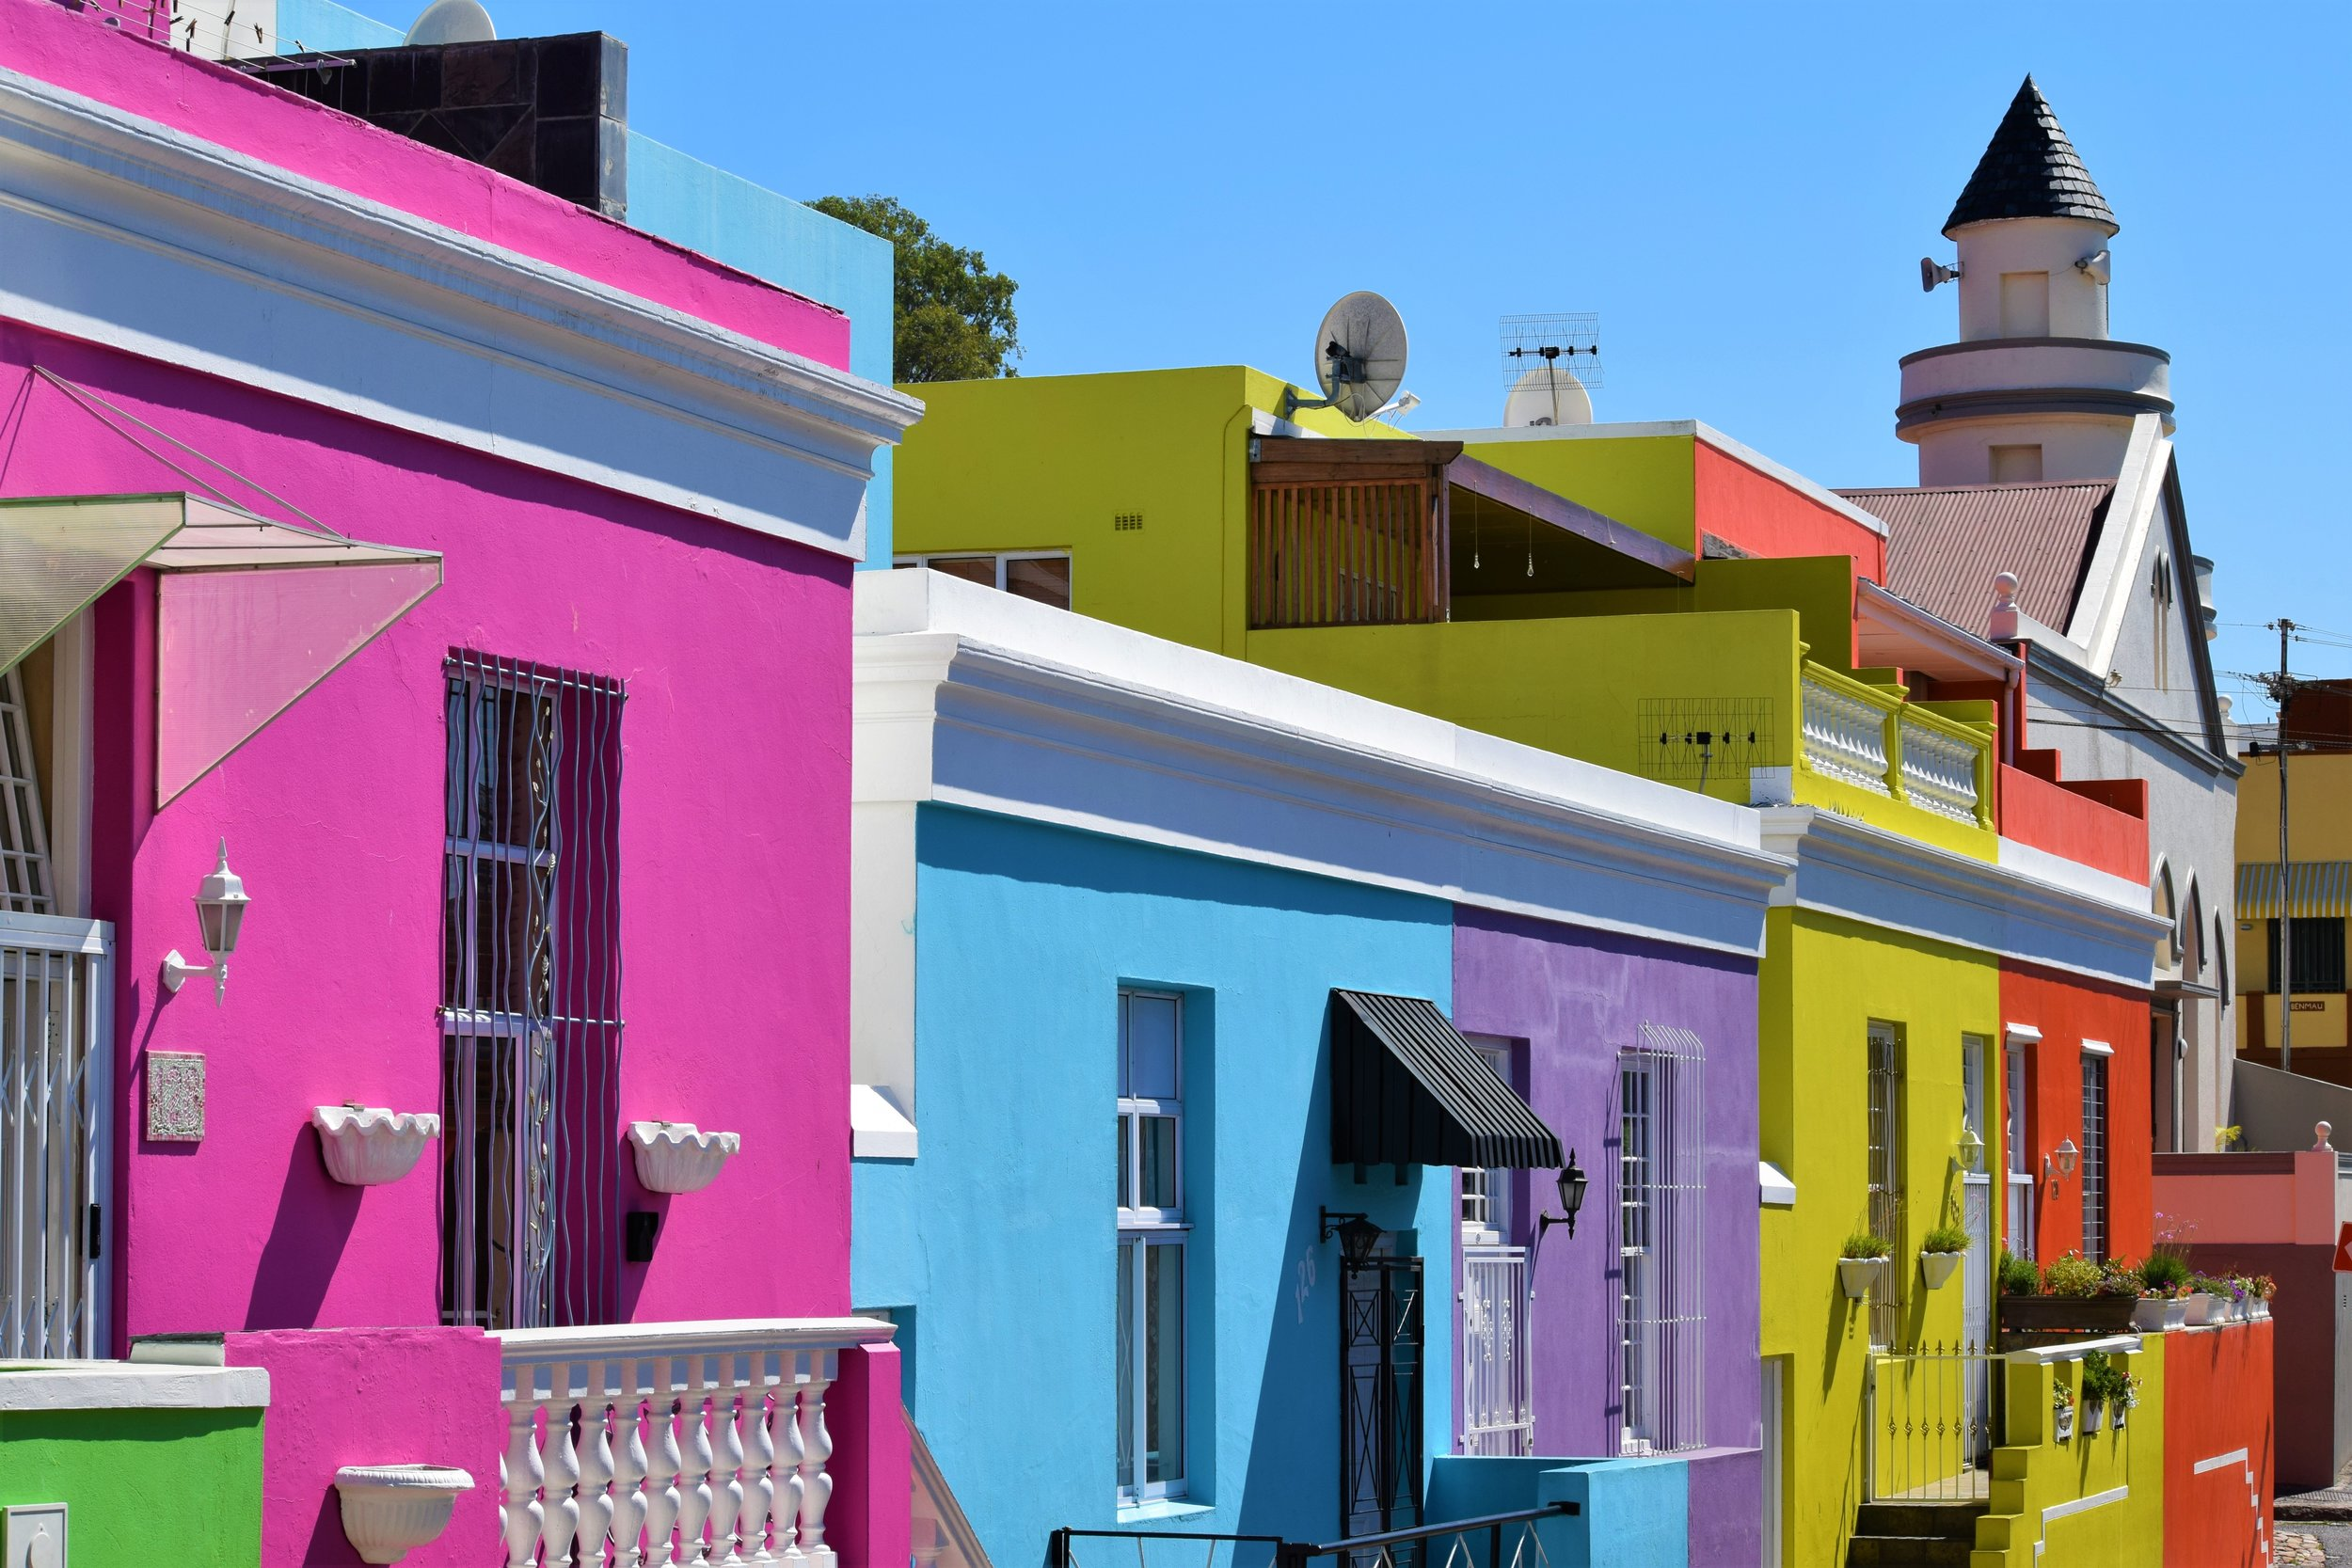 Cape Town, South Africa (photo: Ken Treloar, unsplash.com)